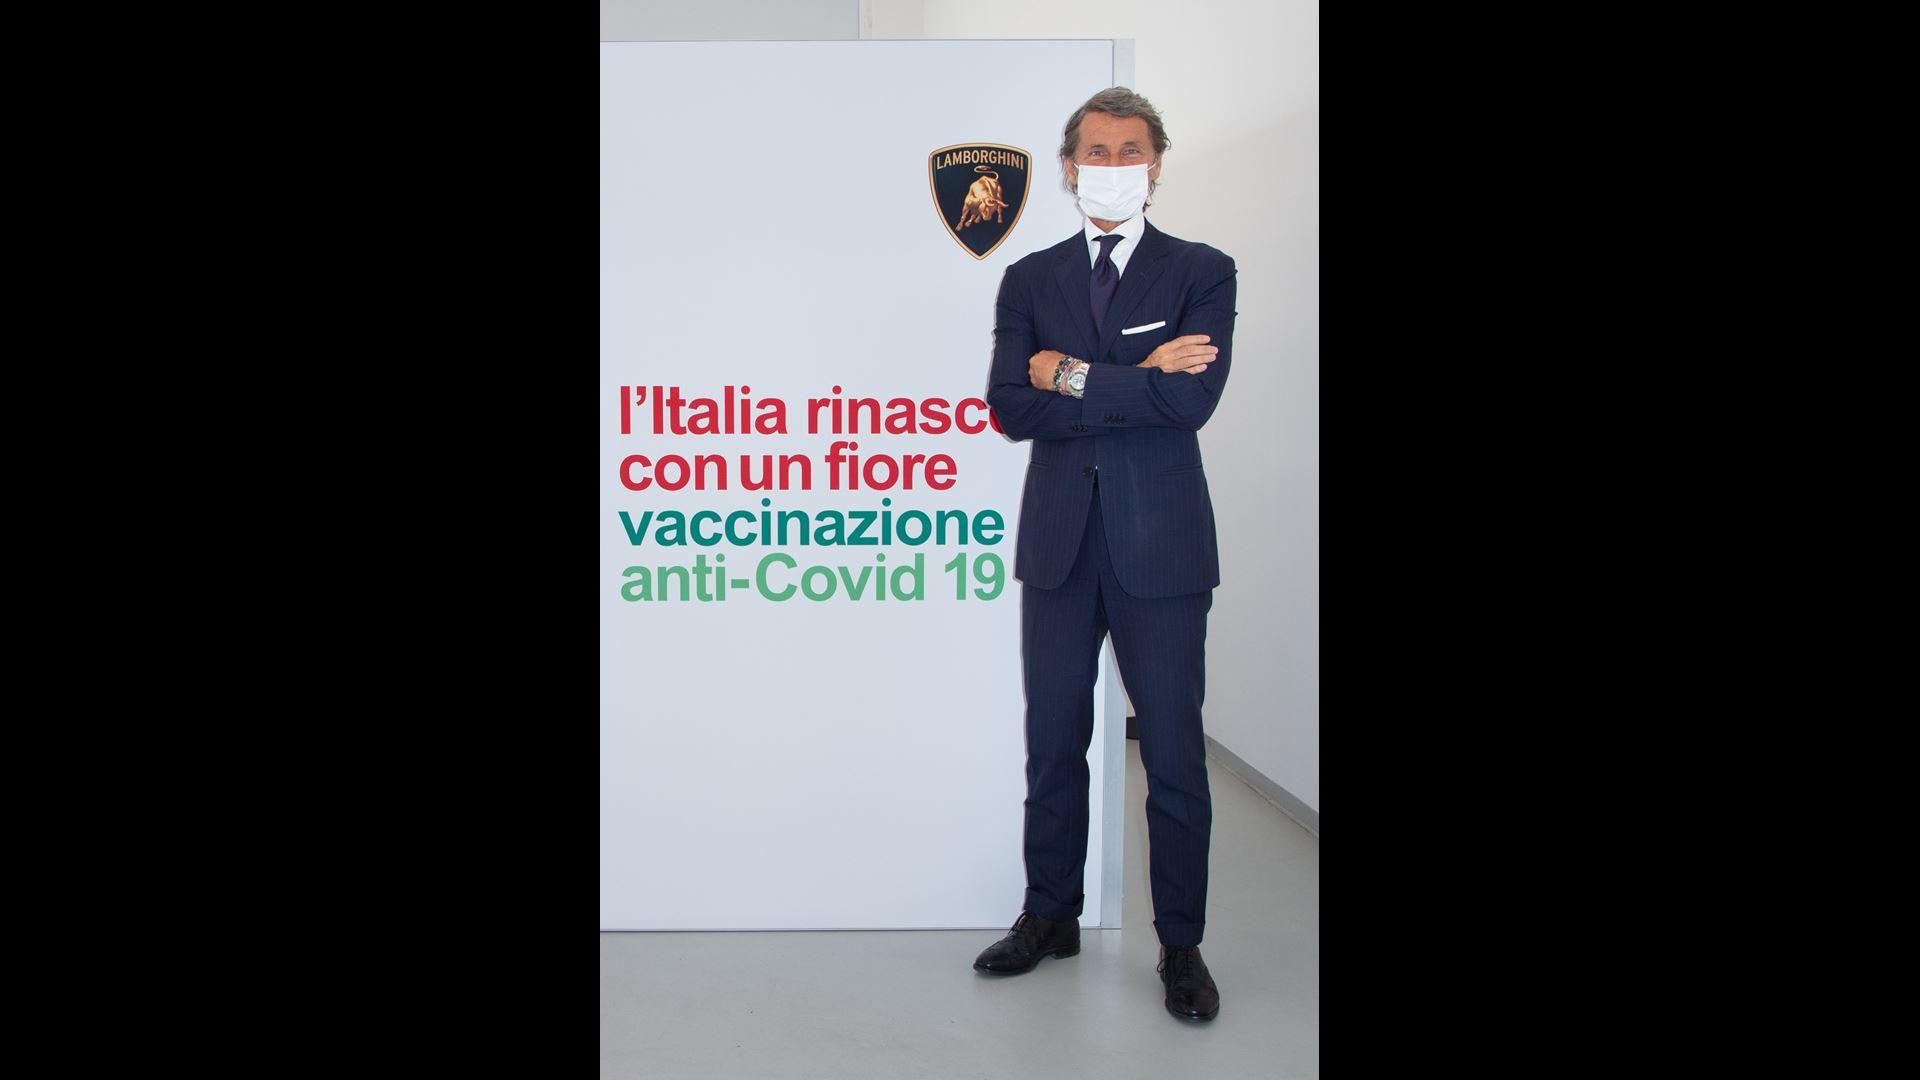 Automobili Lamborghini opens the company vaccination centre - All employees vaccinated in three day - Image 3